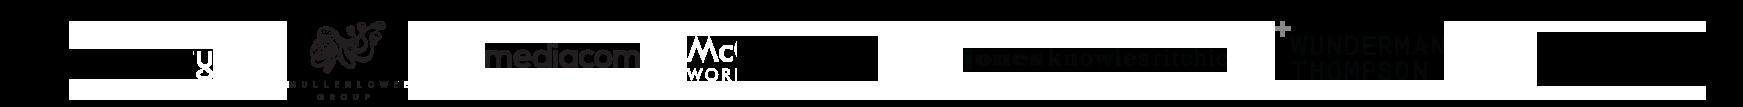 agencyOS_clientlogos_NewAgency